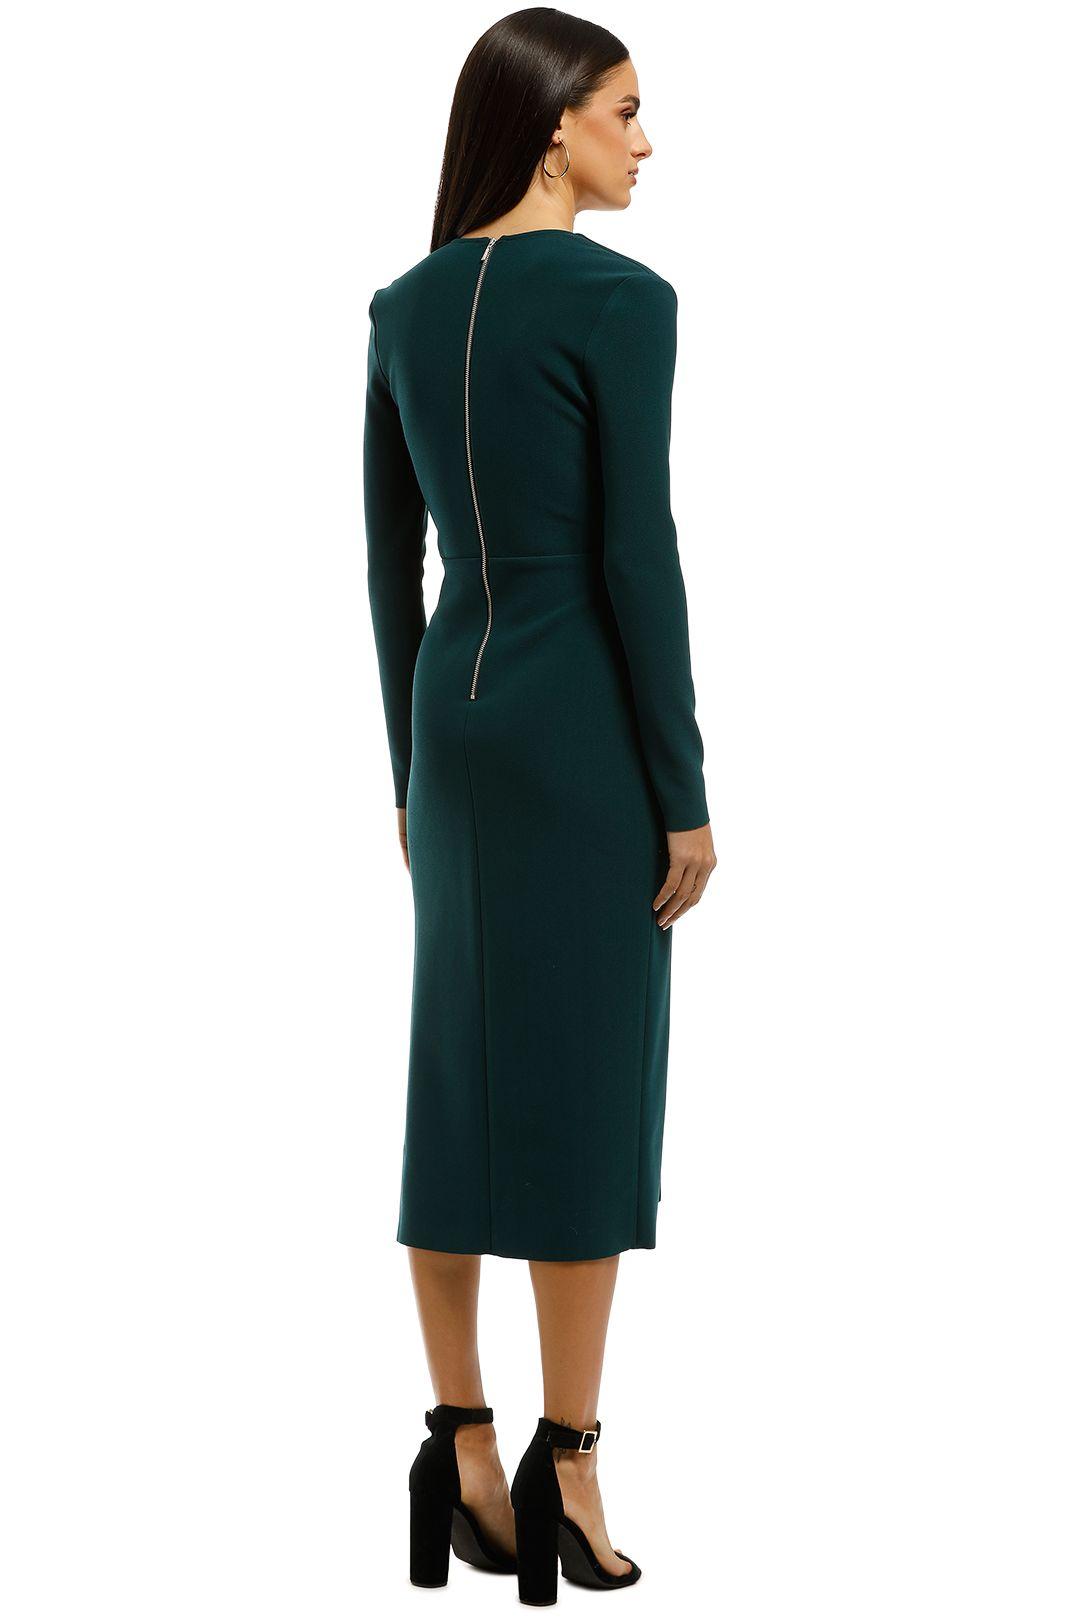 Bec+Bridge-Tasha-LS-Midi-Dress-Emerald-Back